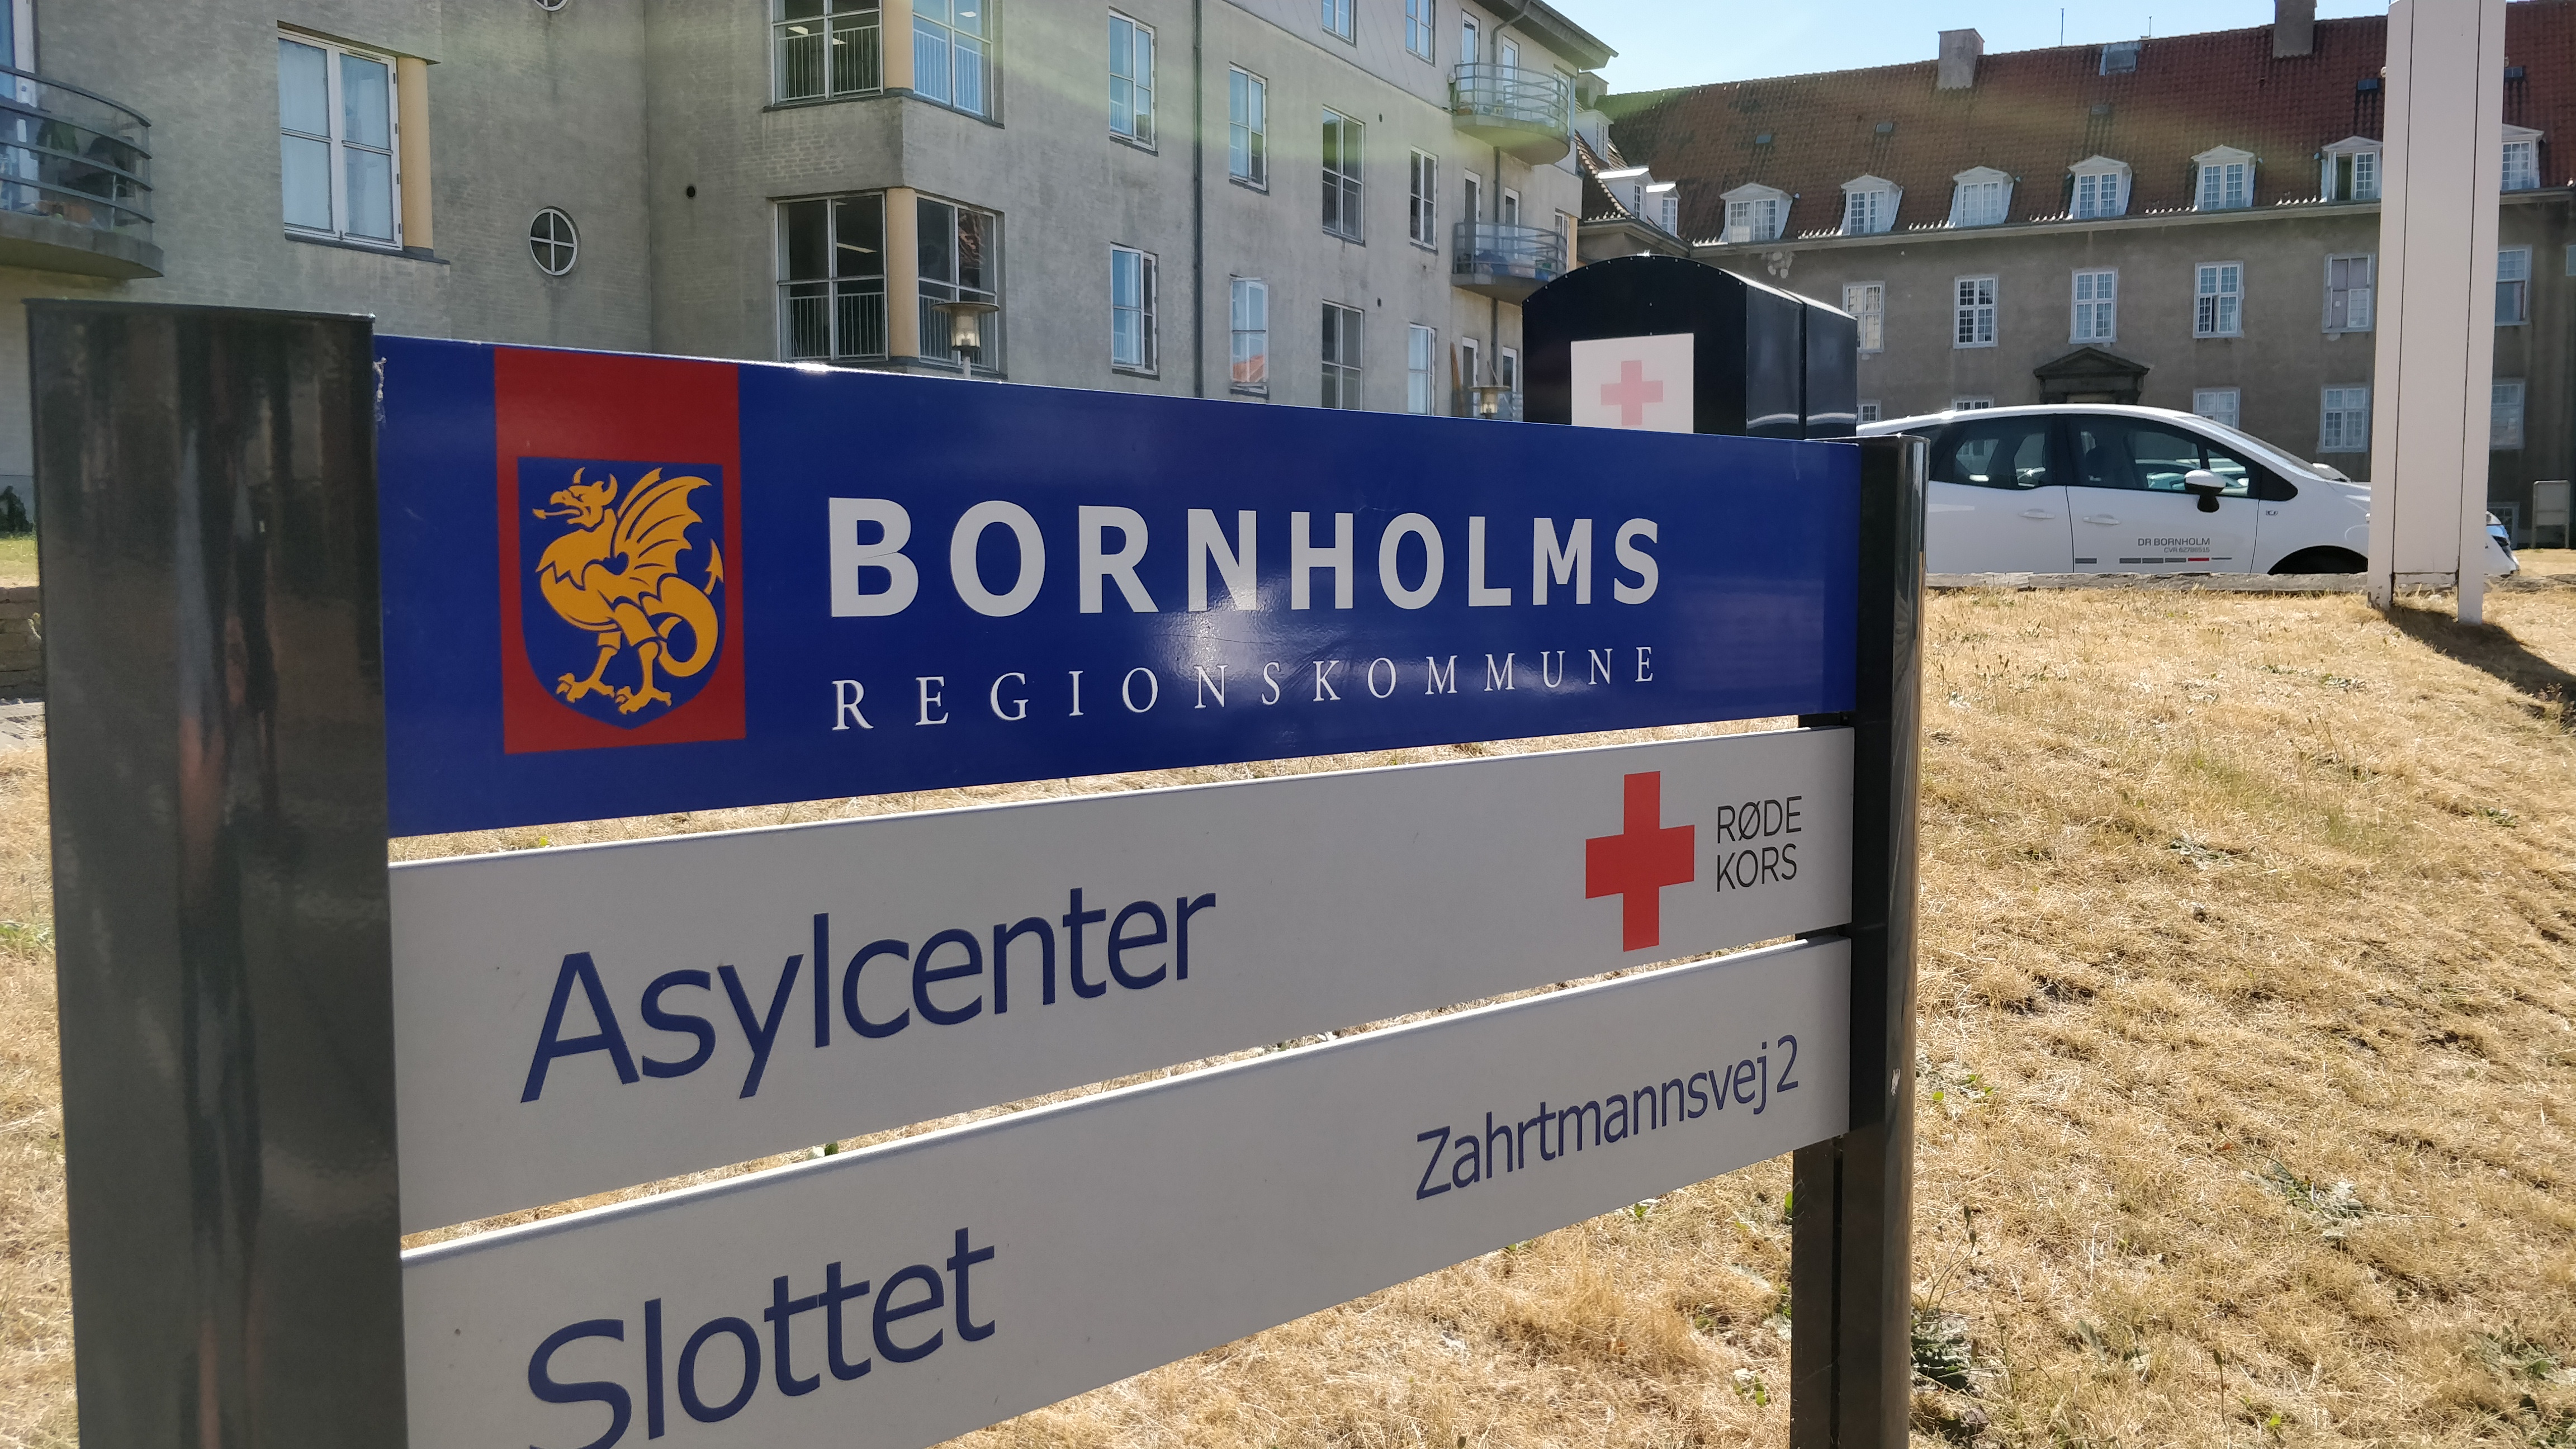 Røde Kors Asylcenter Slottet